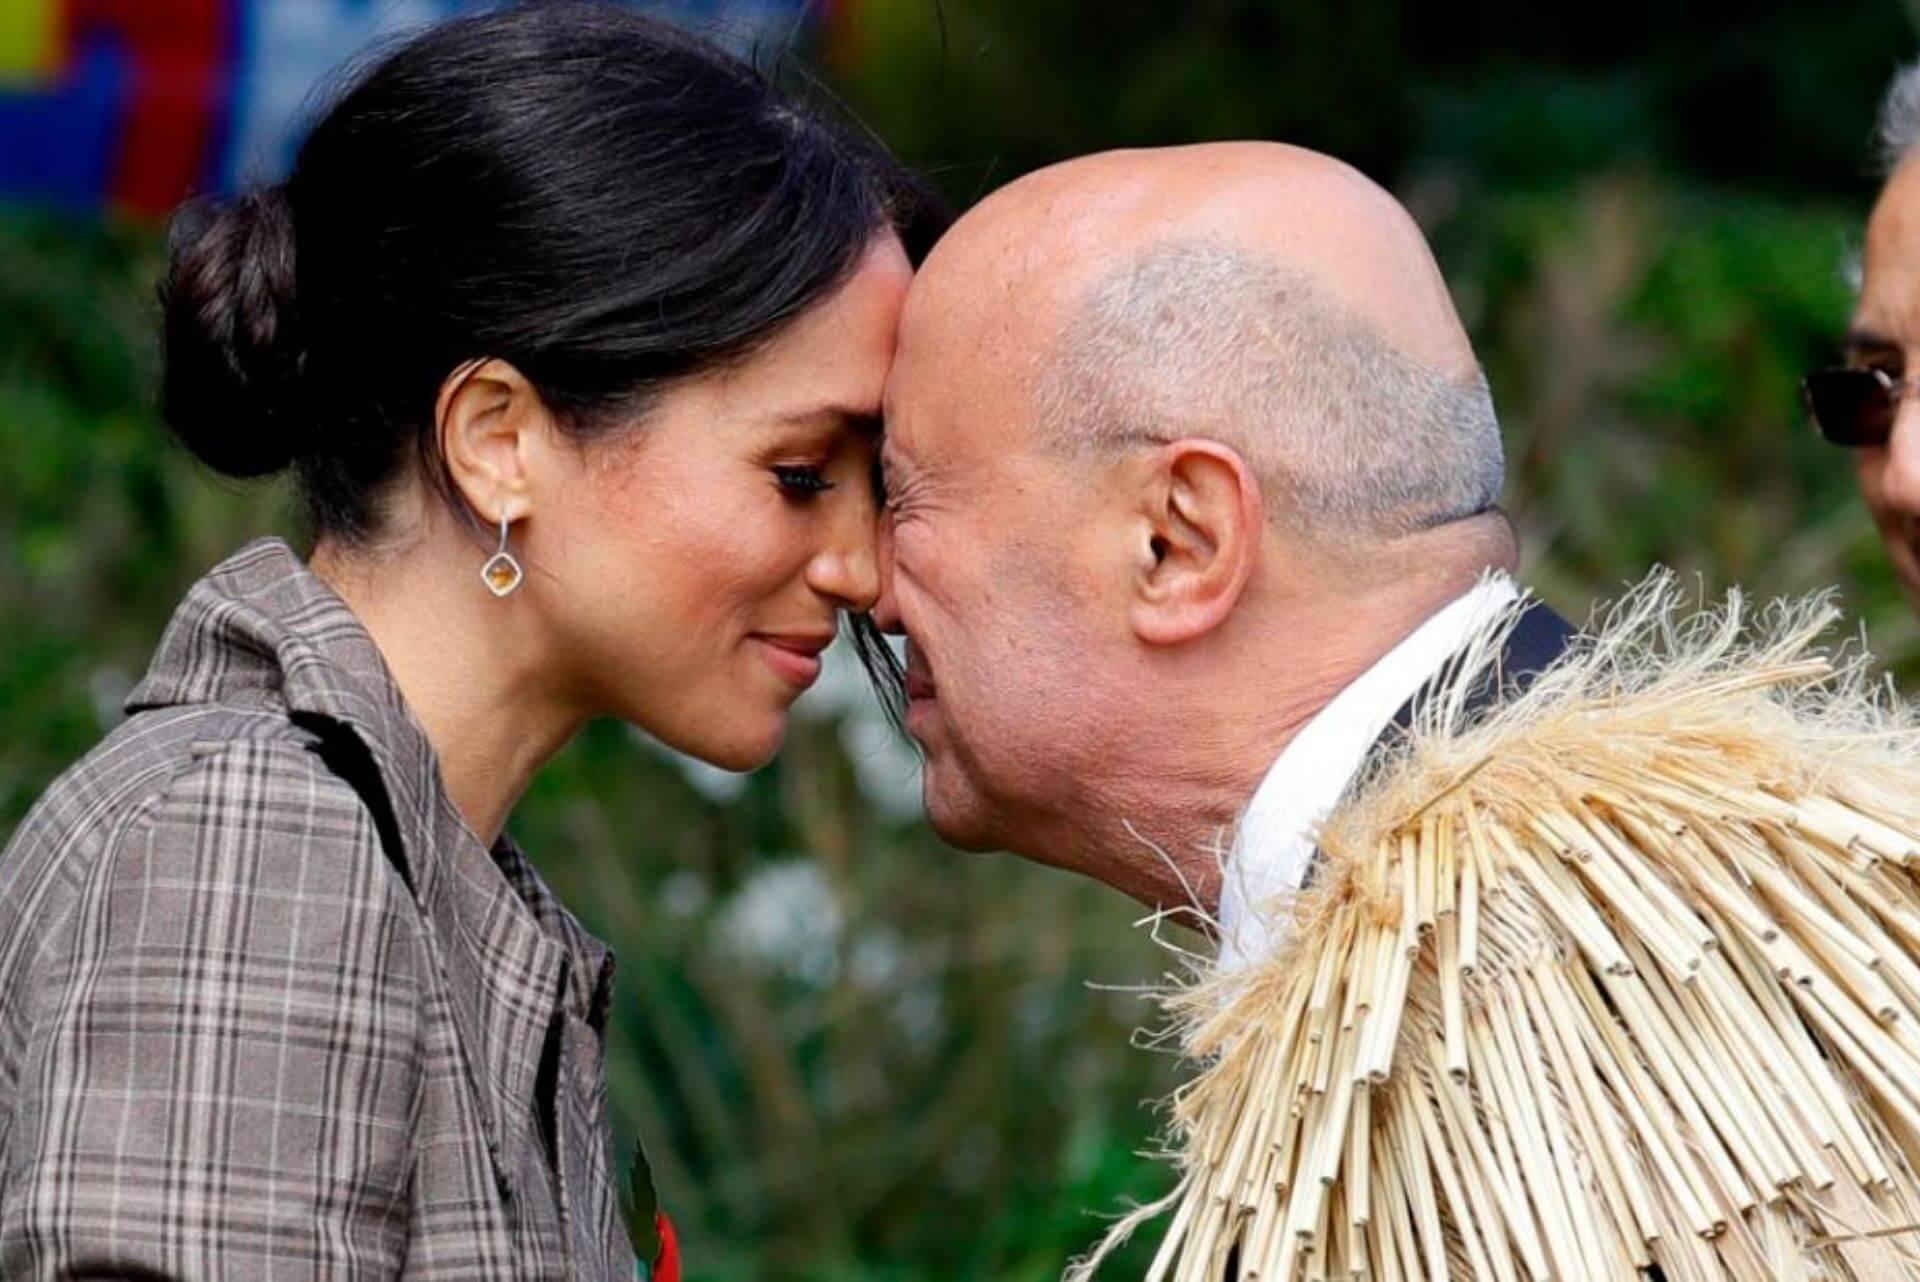 meghan fa il saluto maori durante la visita in nuova zelanda